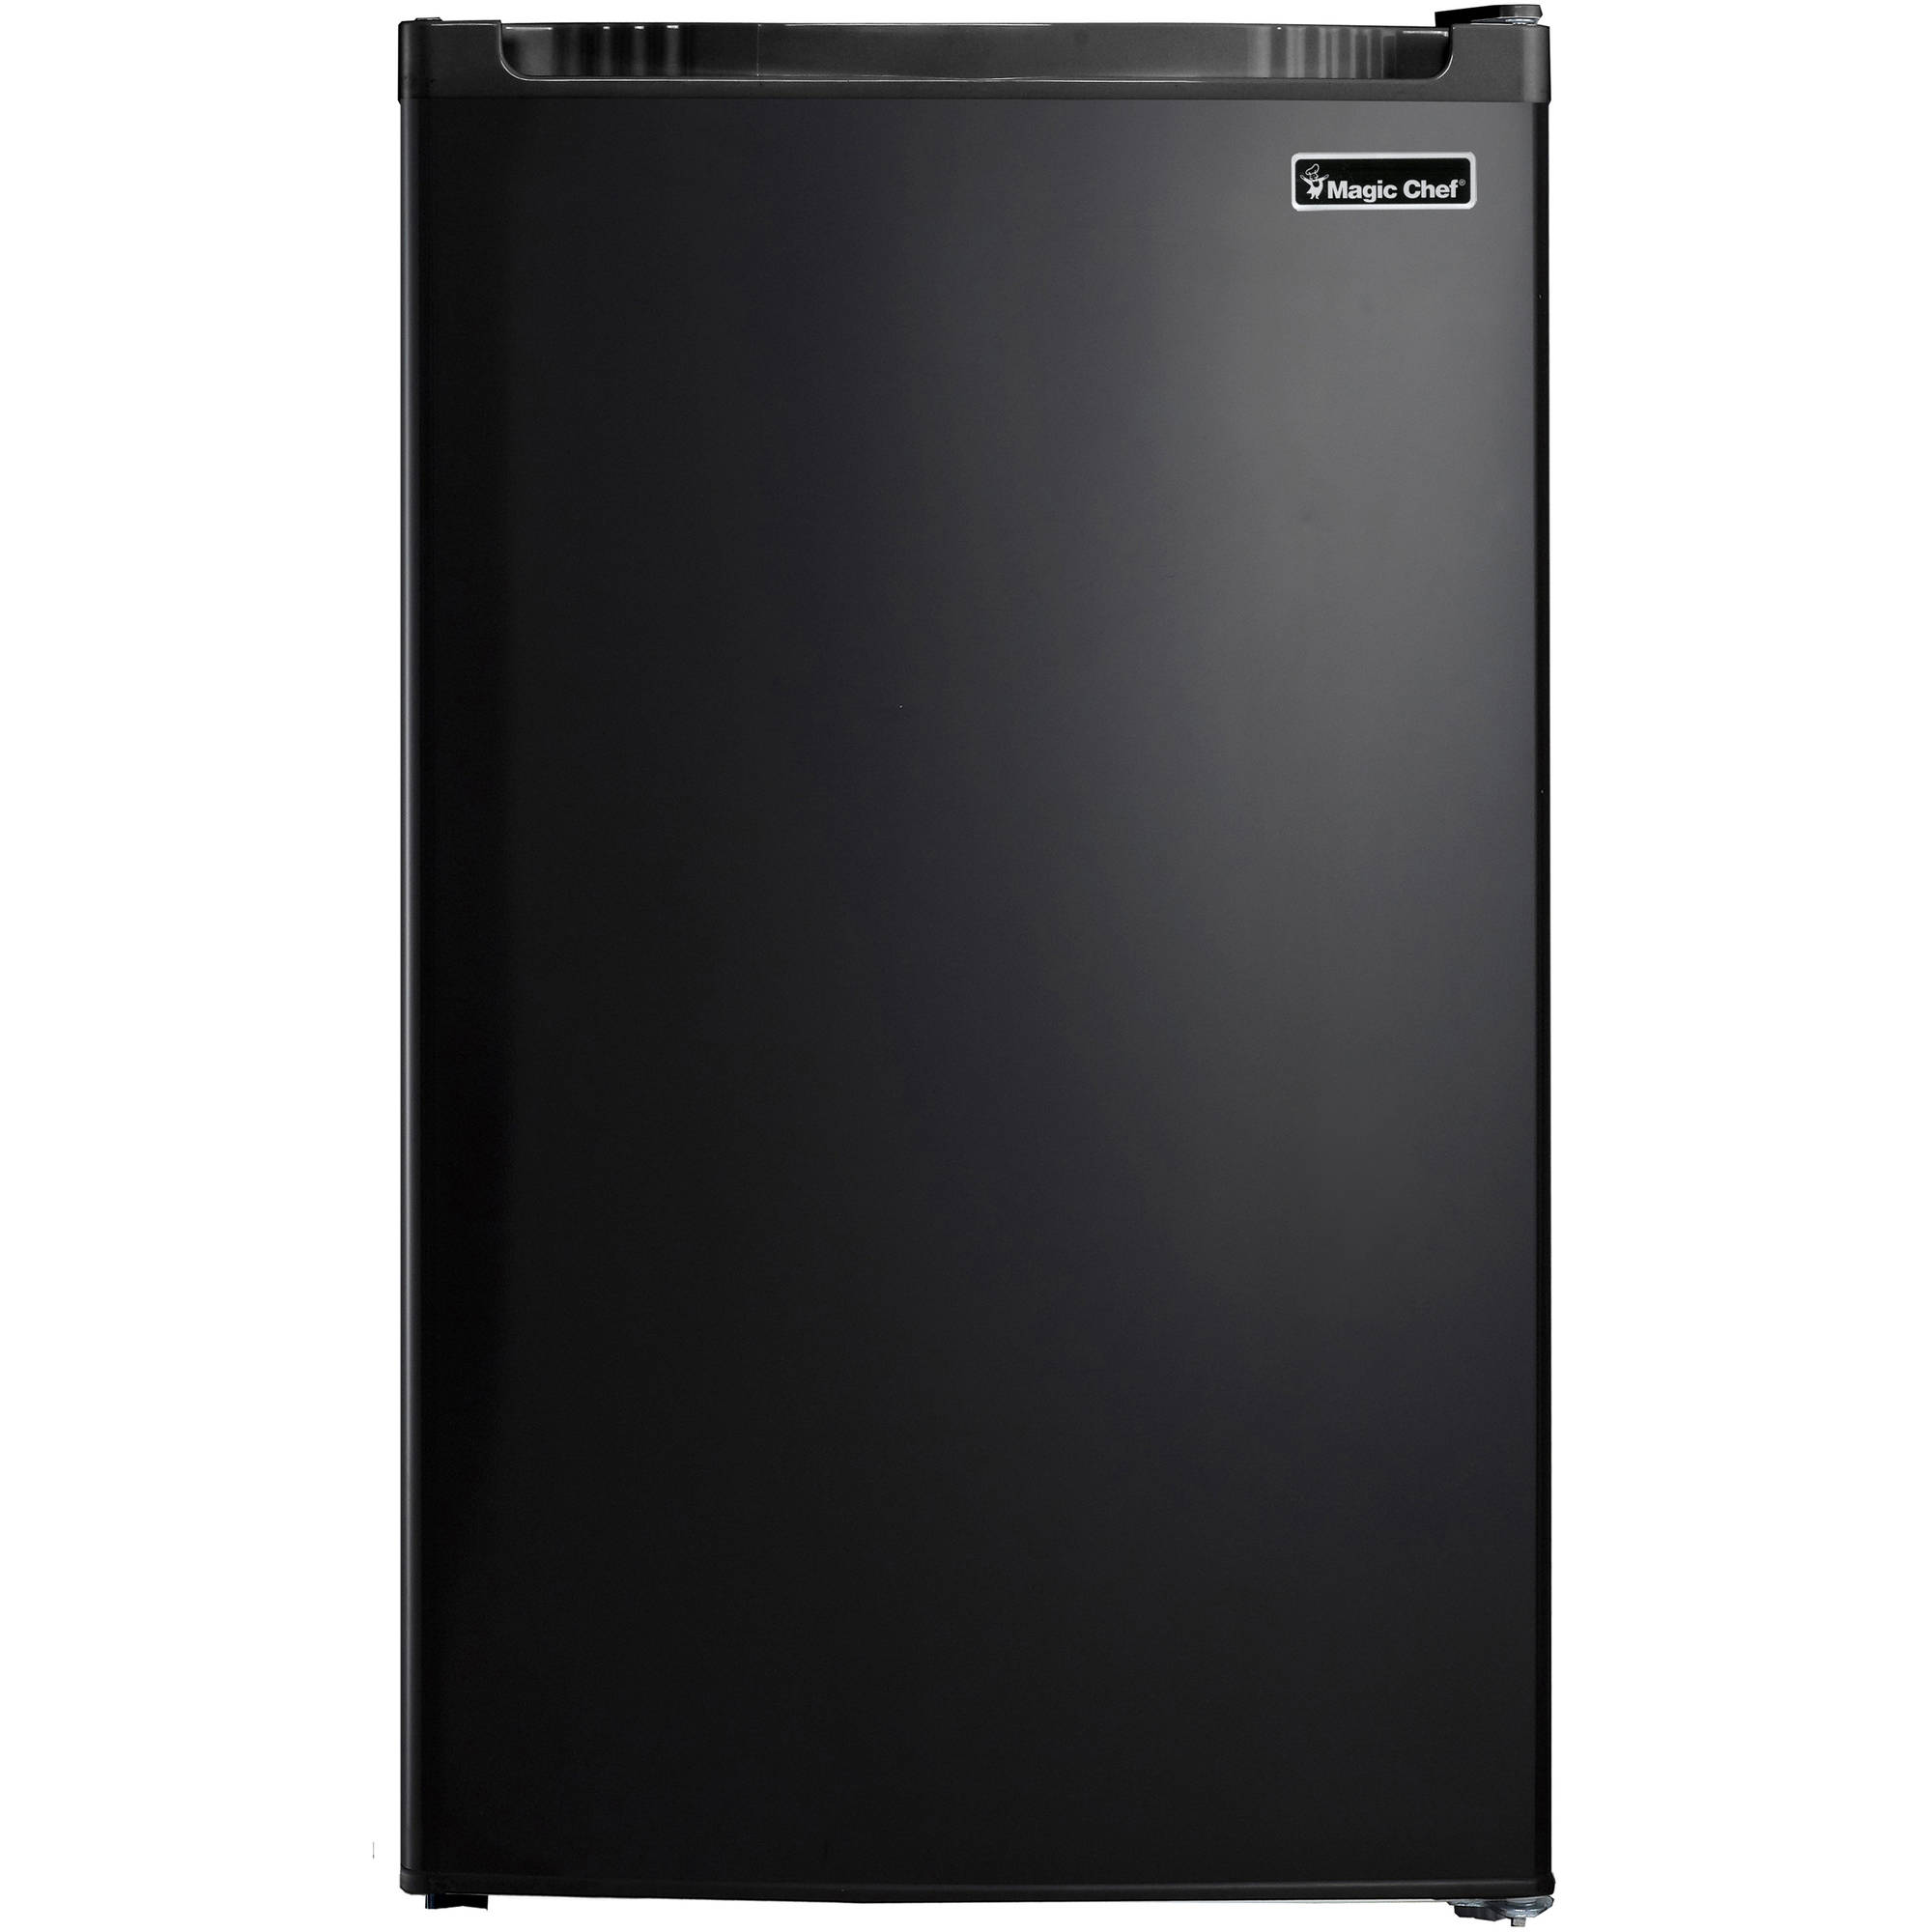 Magic Chef MCBR440B2 4.4 cu ft Refrigerator, Black